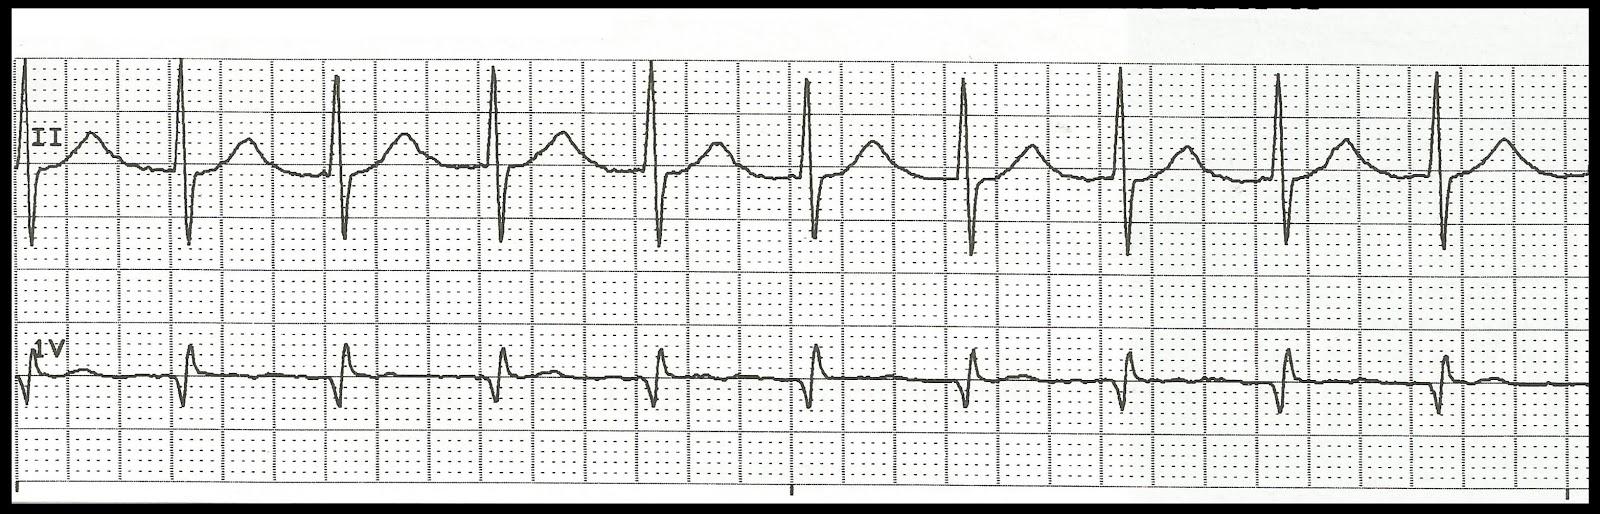 Float Nurse: Basic EKG Rhythm Test 08